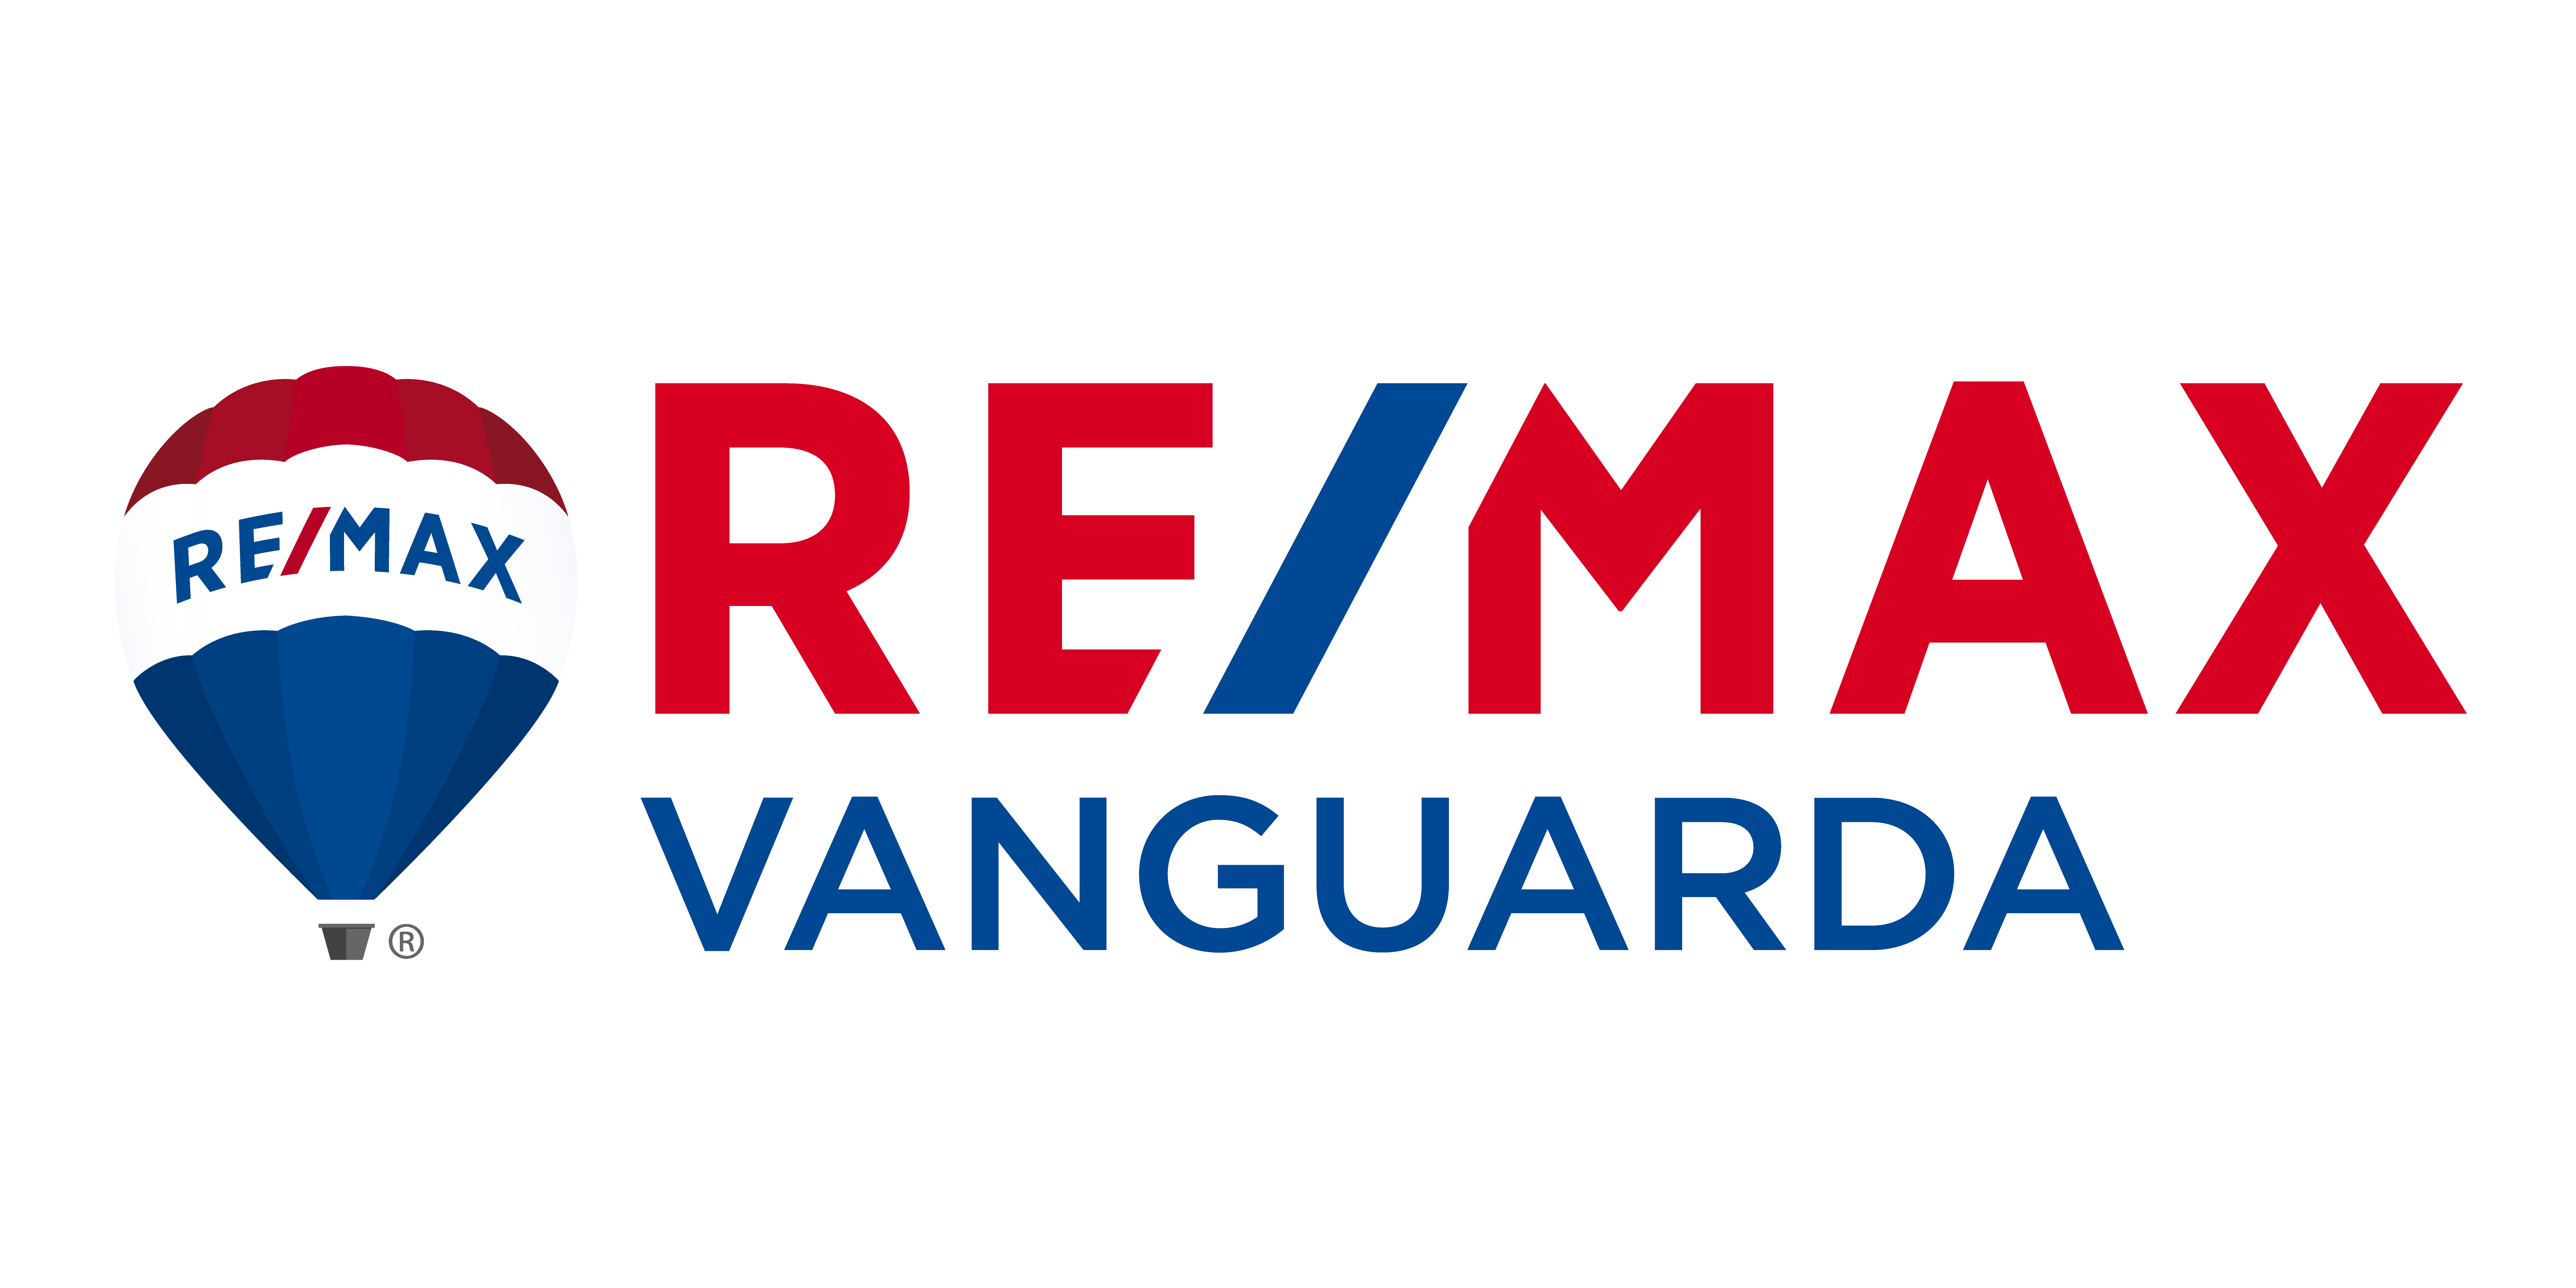 RE/MAX Vanguarda